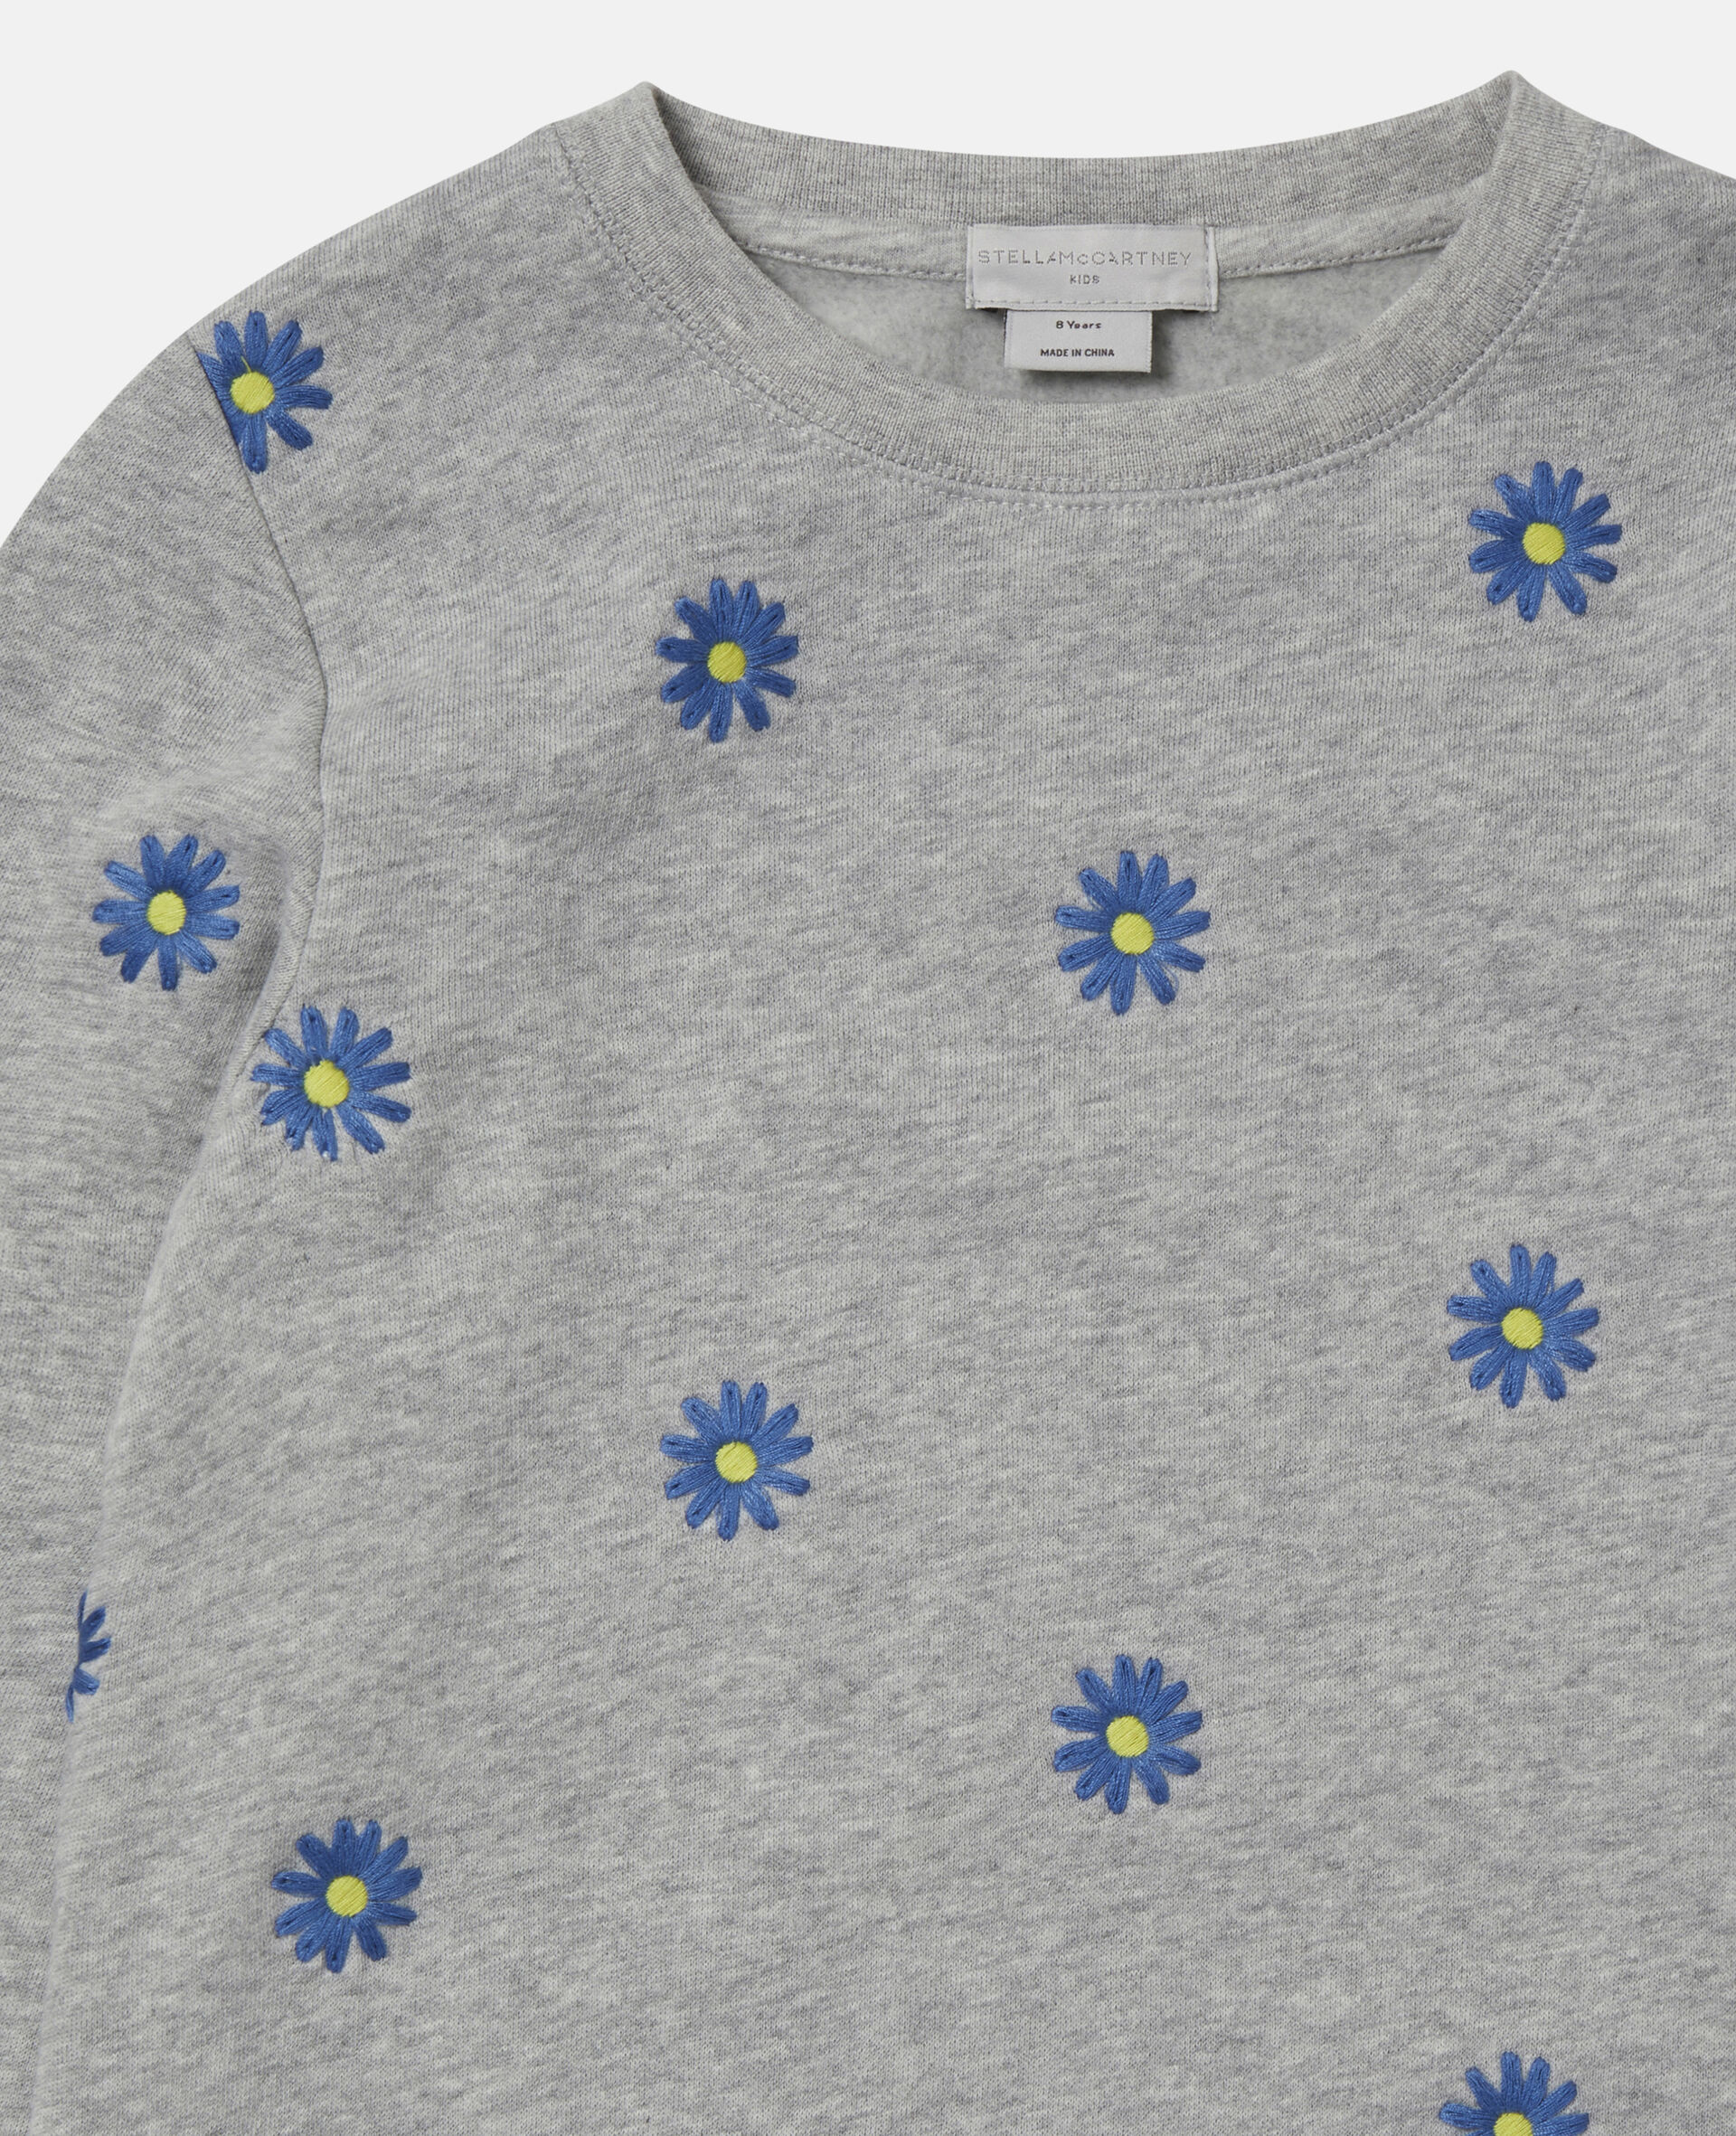 Baumwollfleece-Sweatshirt mit Gänseblümchenmotiv -Grau-large image number 1